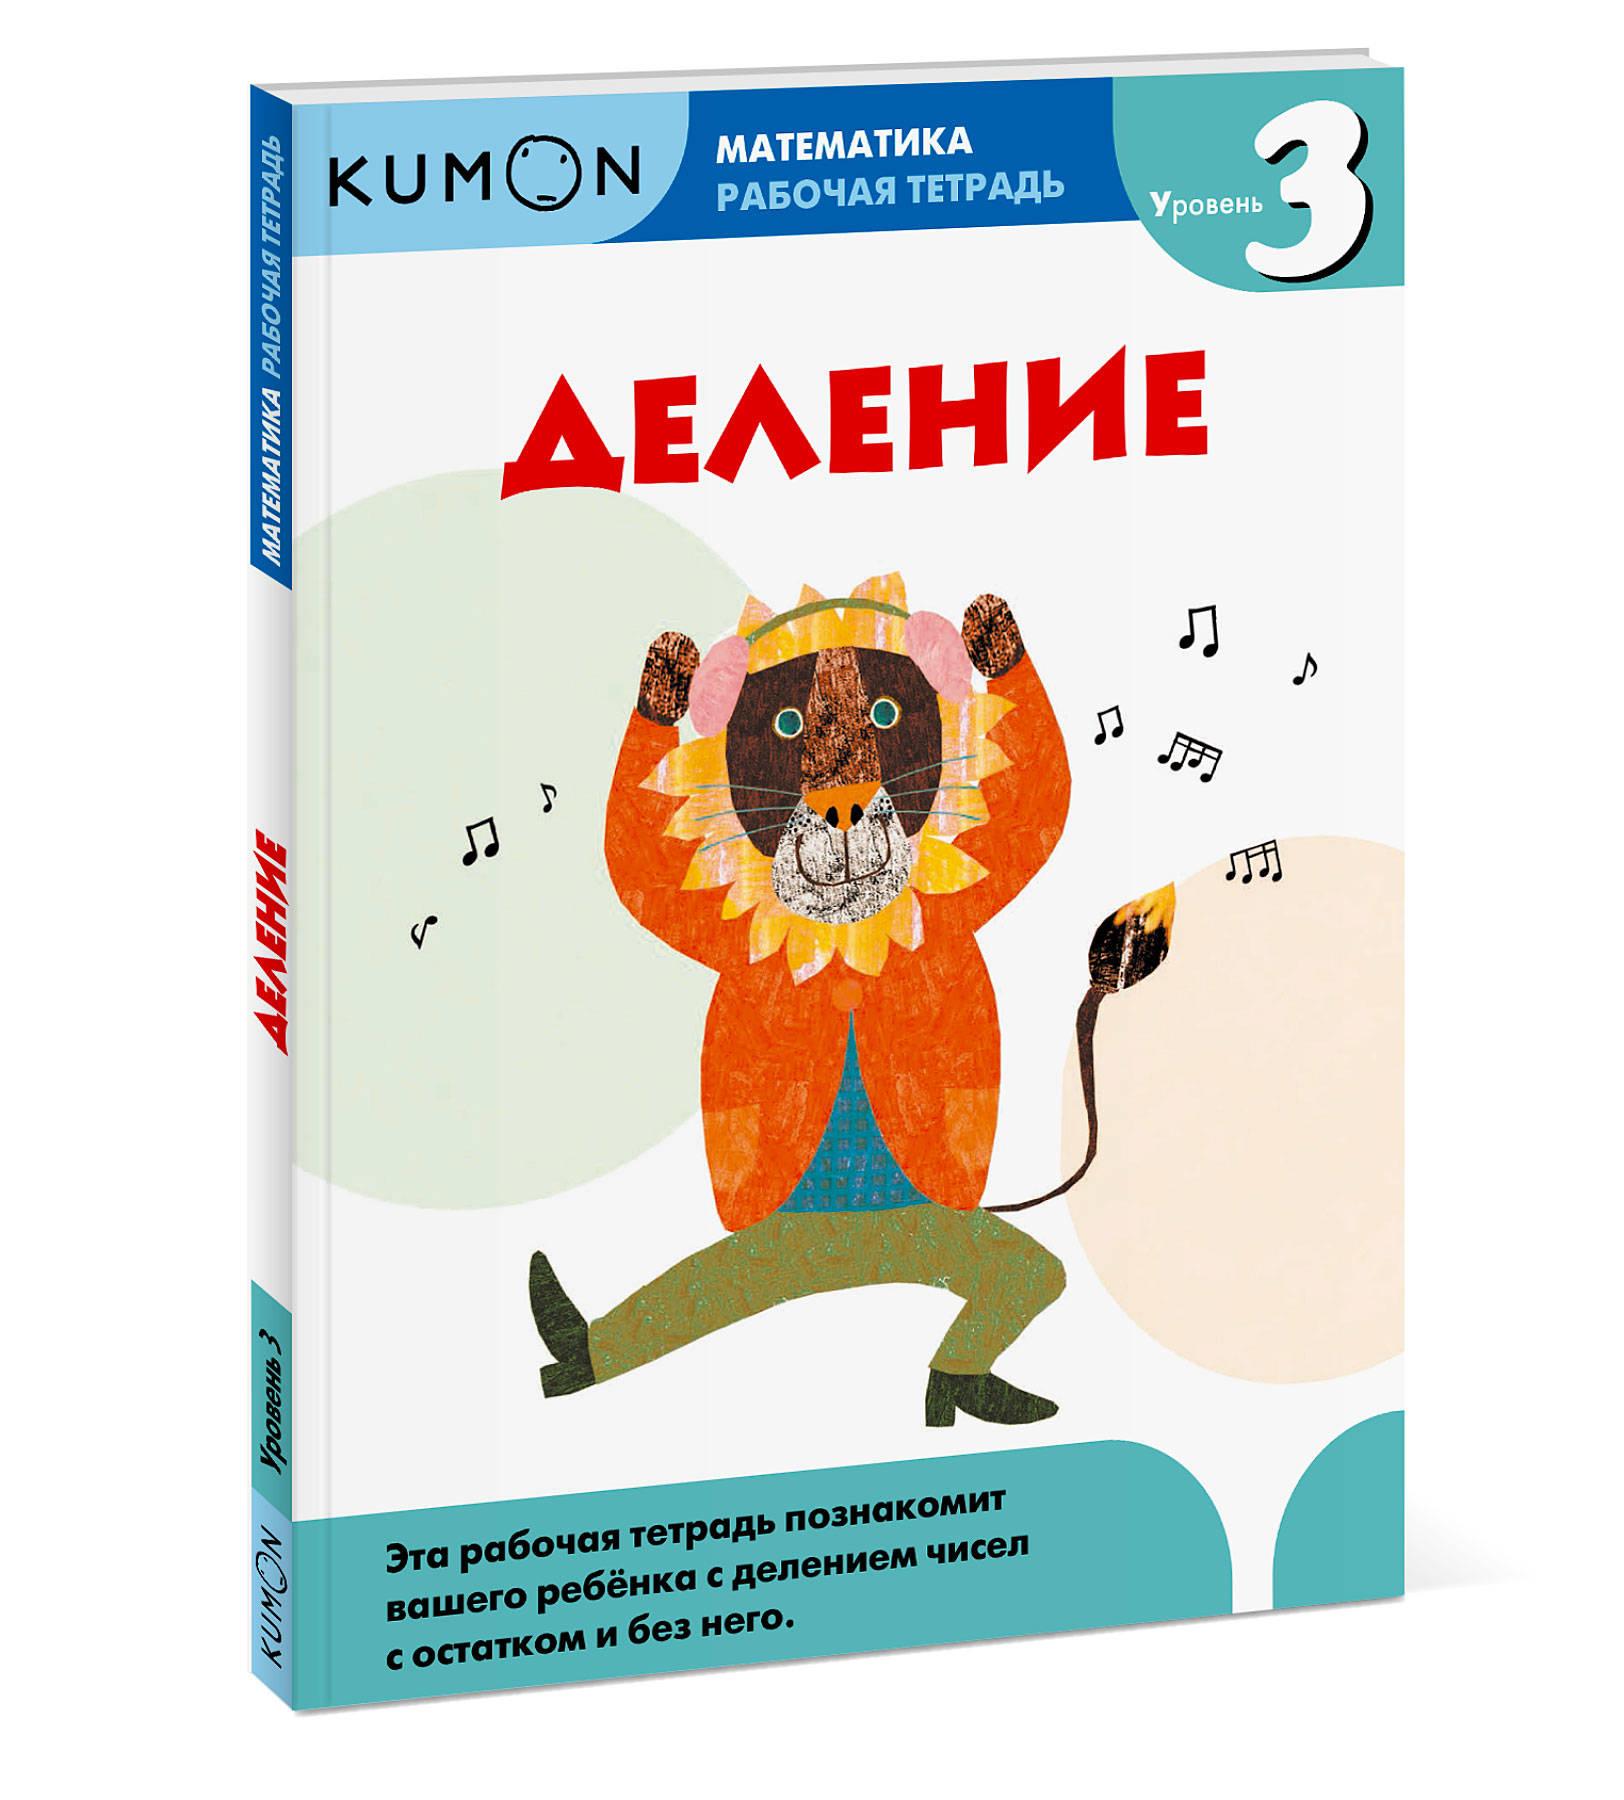 Kumon Математика. Деление. Уровень 3 Kumon ISBN: 978-5-00100-044-0